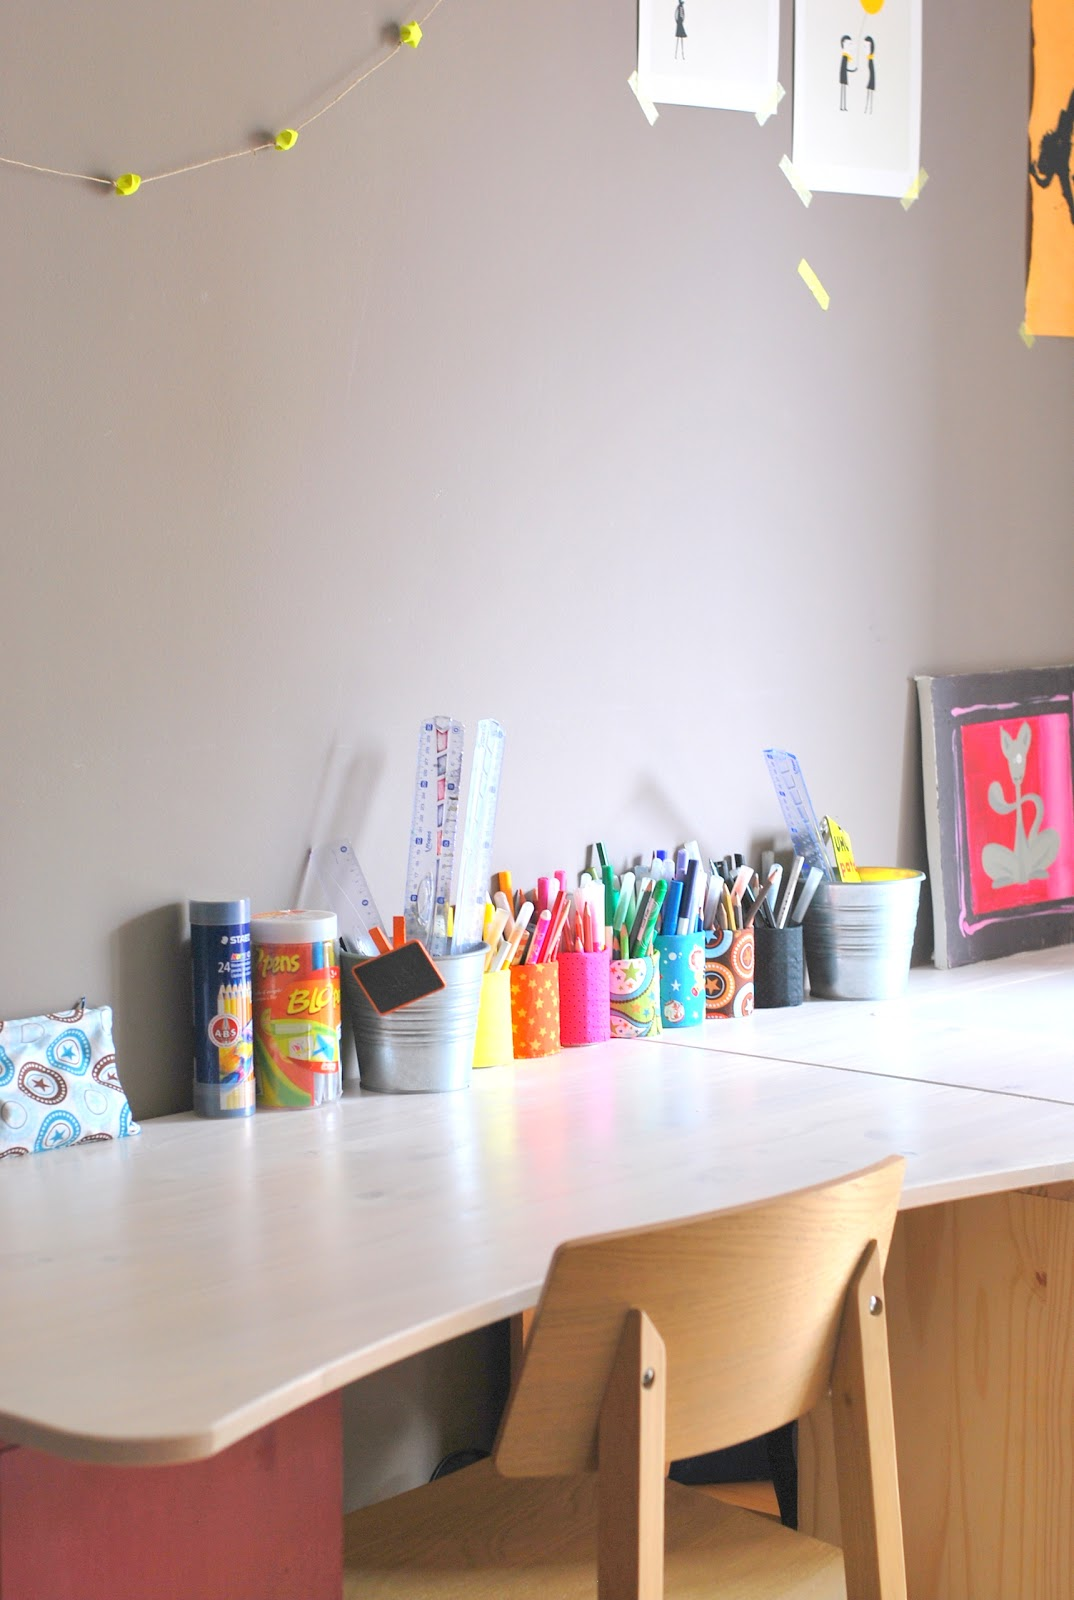 le grand bazaar range ta chambre. Black Bedroom Furniture Sets. Home Design Ideas